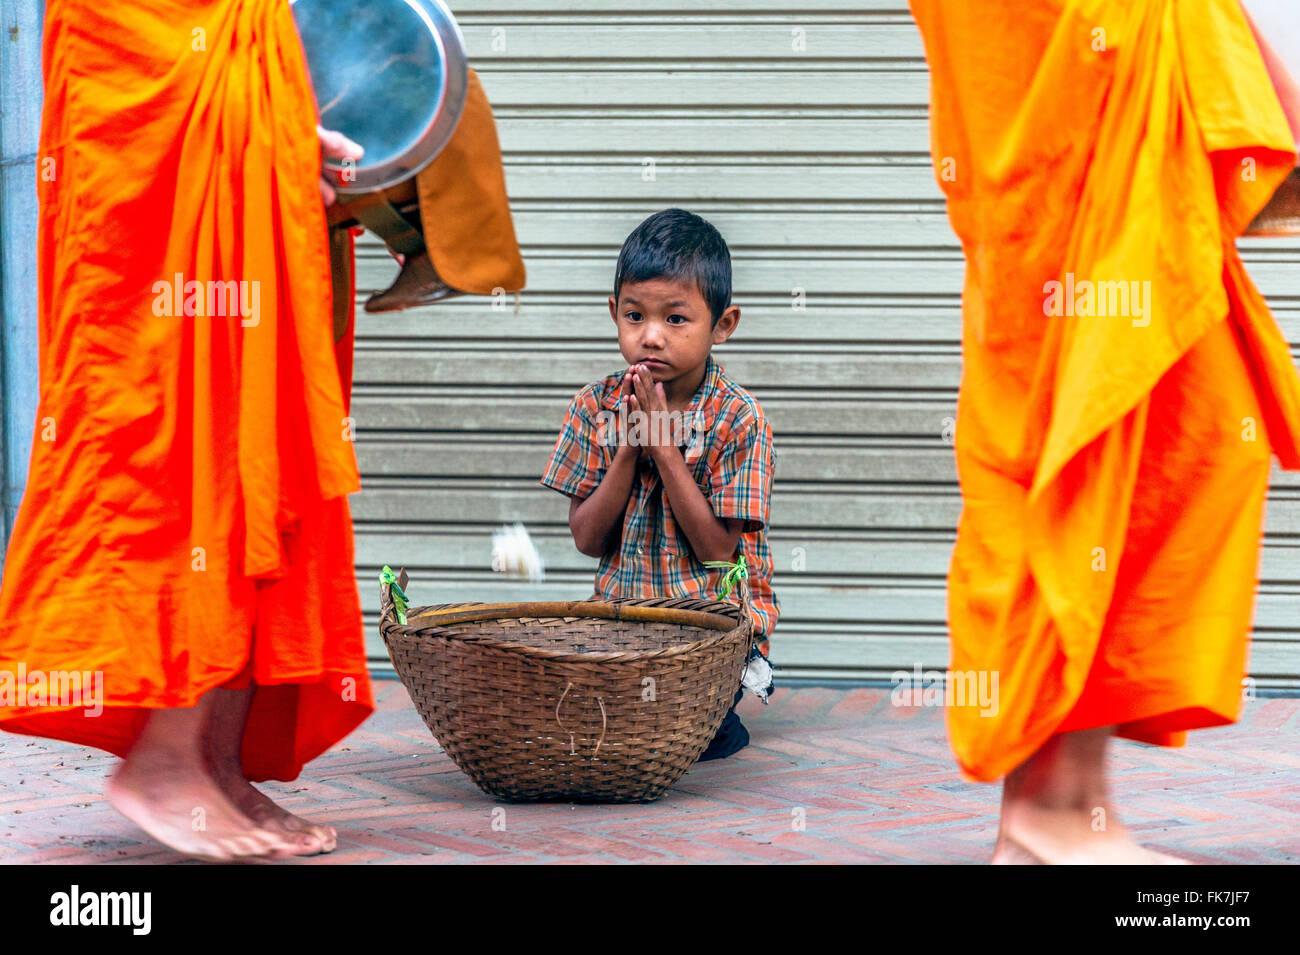 Asien. Süd-Ost-Asien. Laos. Provinz von Luang Prabang, Stadt Luang Prabang, armer kleiner Junge Almosen von Stockbild